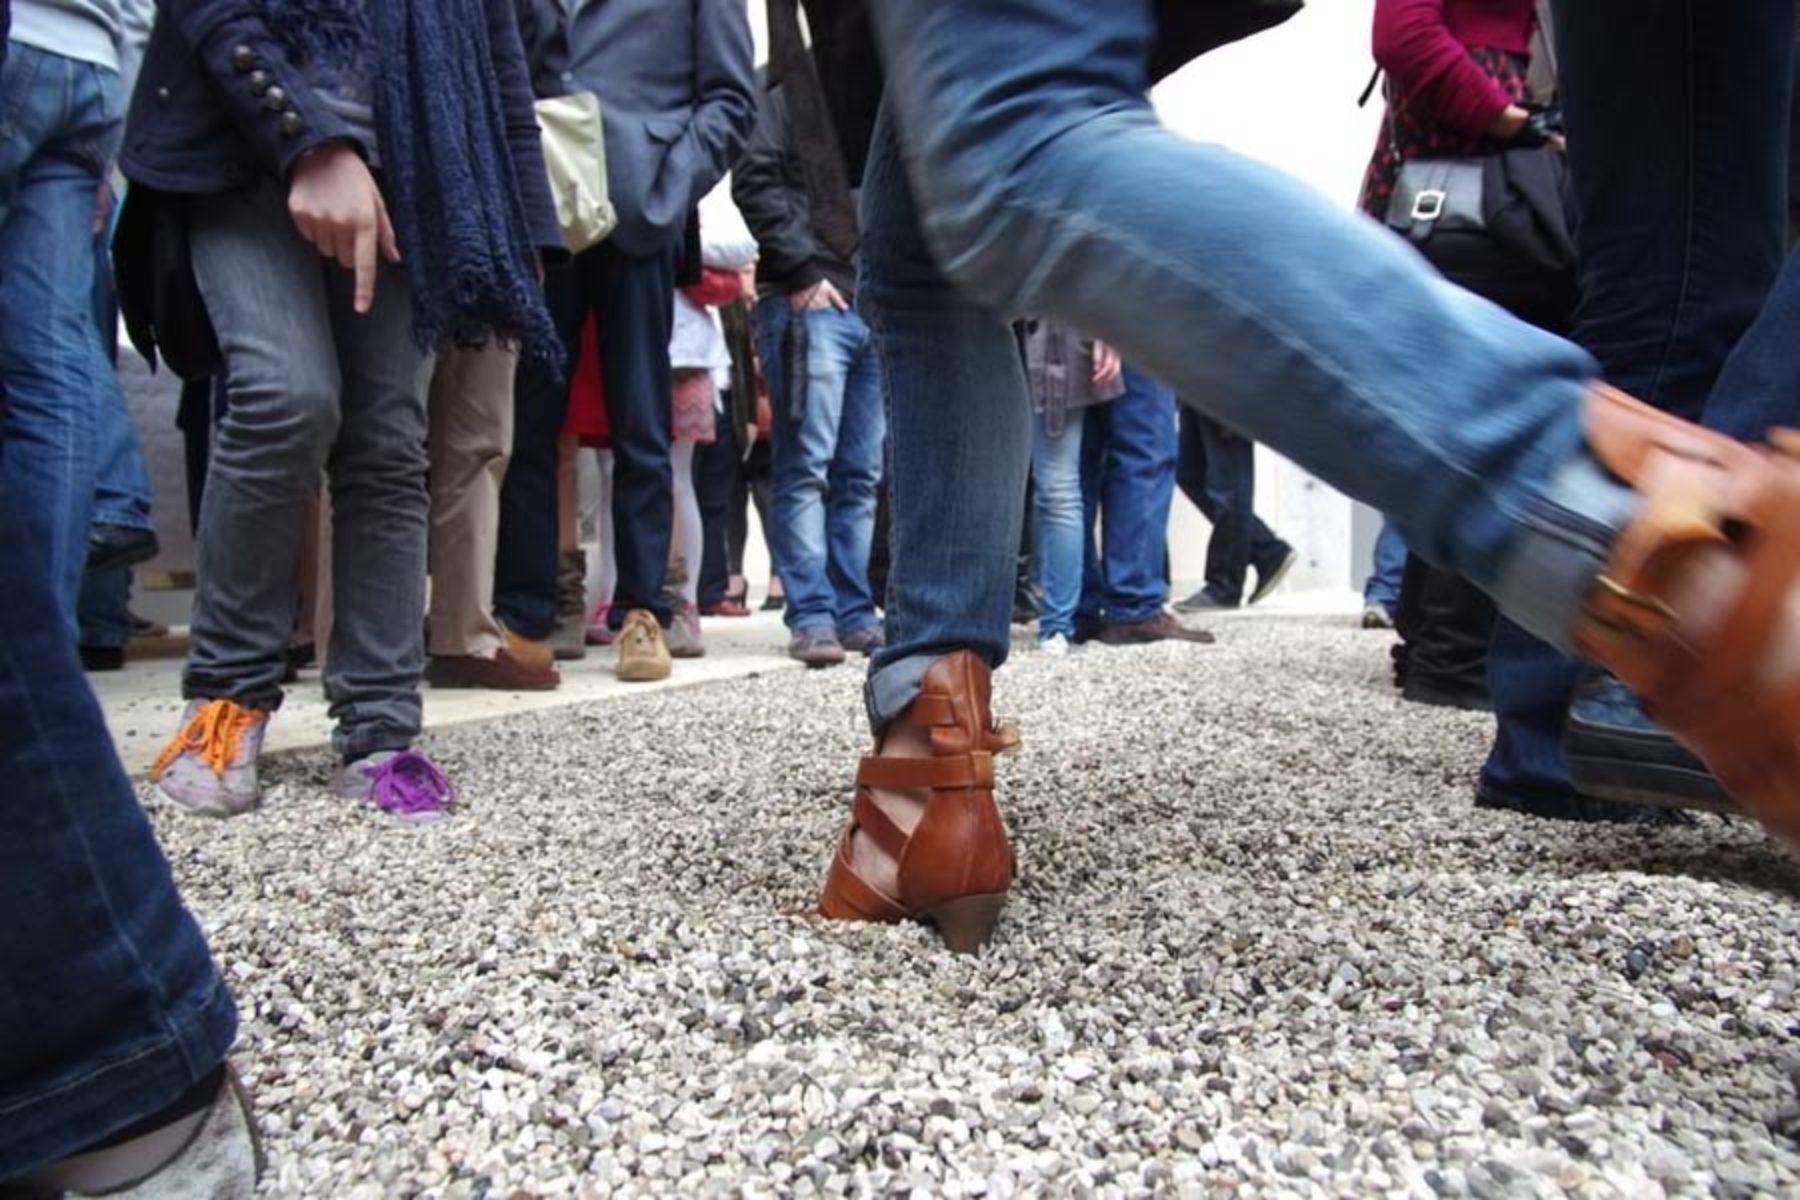 Ivan Moudov, Stones, 2013, stones, foam rubber, site specific installation, 19